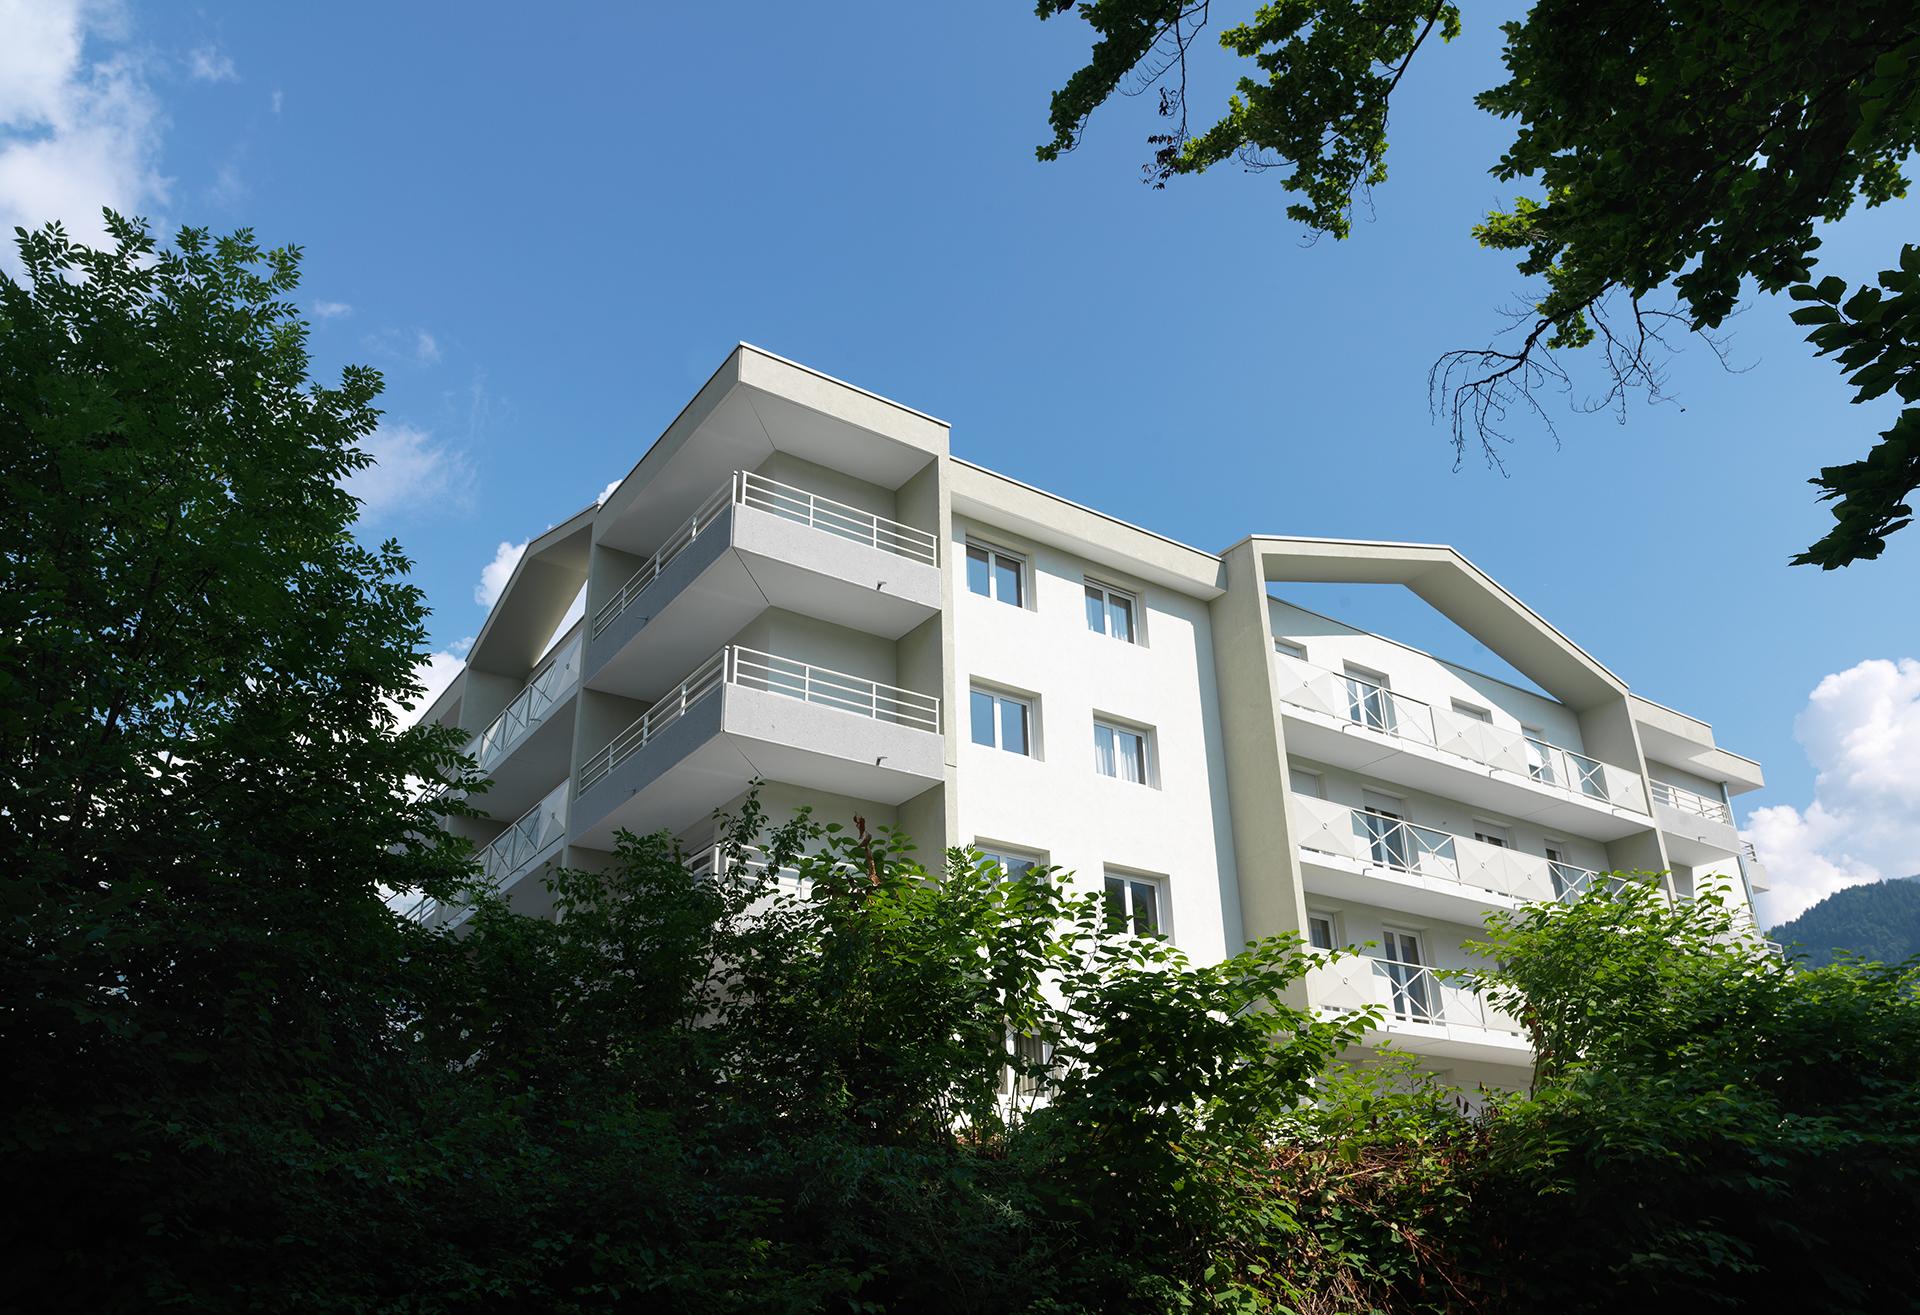 Des programmes immobiliers de haut standing - Residence de haut standing rubio ...